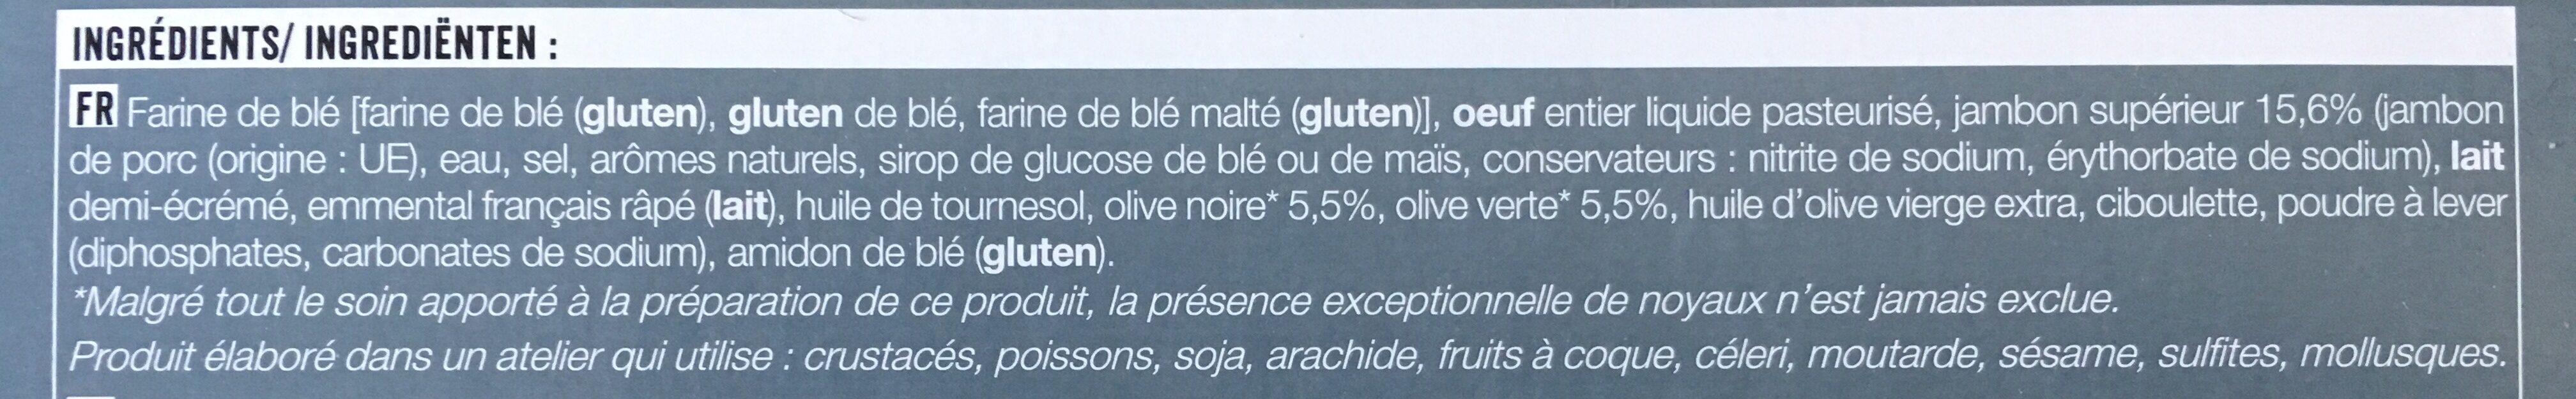 L'Apéritif - Mini cake jambon olives - Ingredients - fr